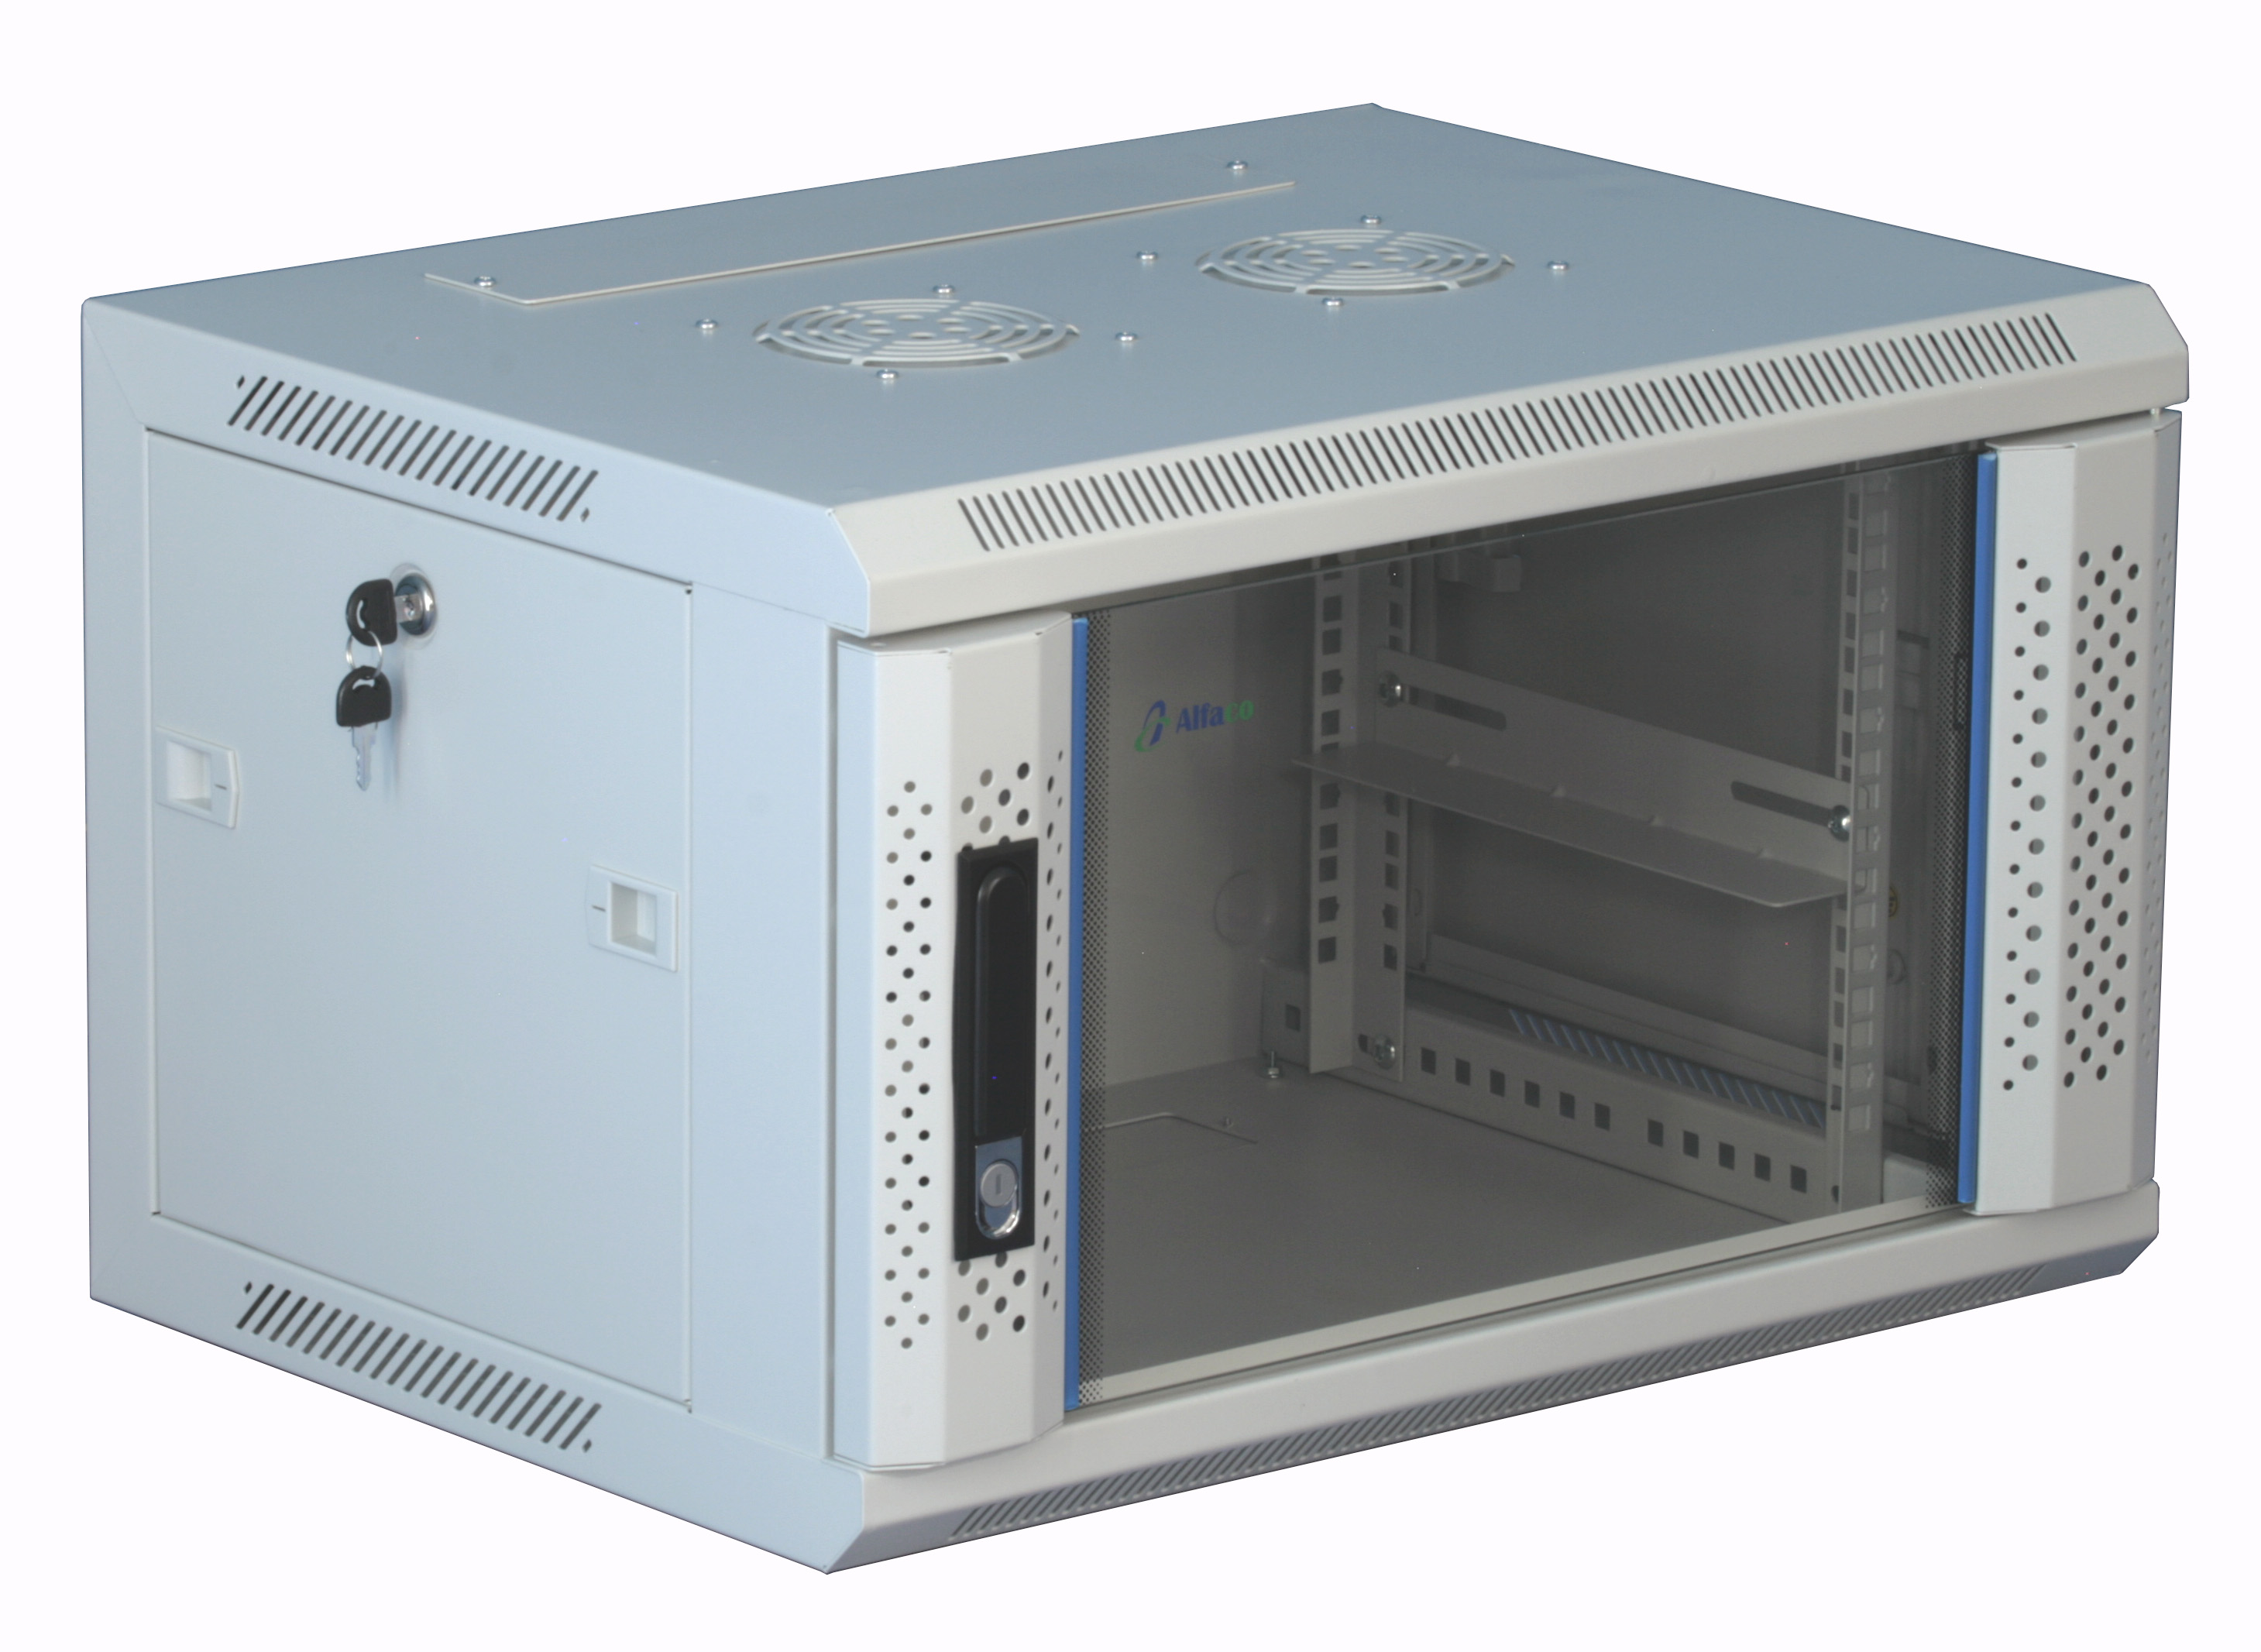 Serverschrank HE: Schränke in verschiedenen Höhen | 19power.de